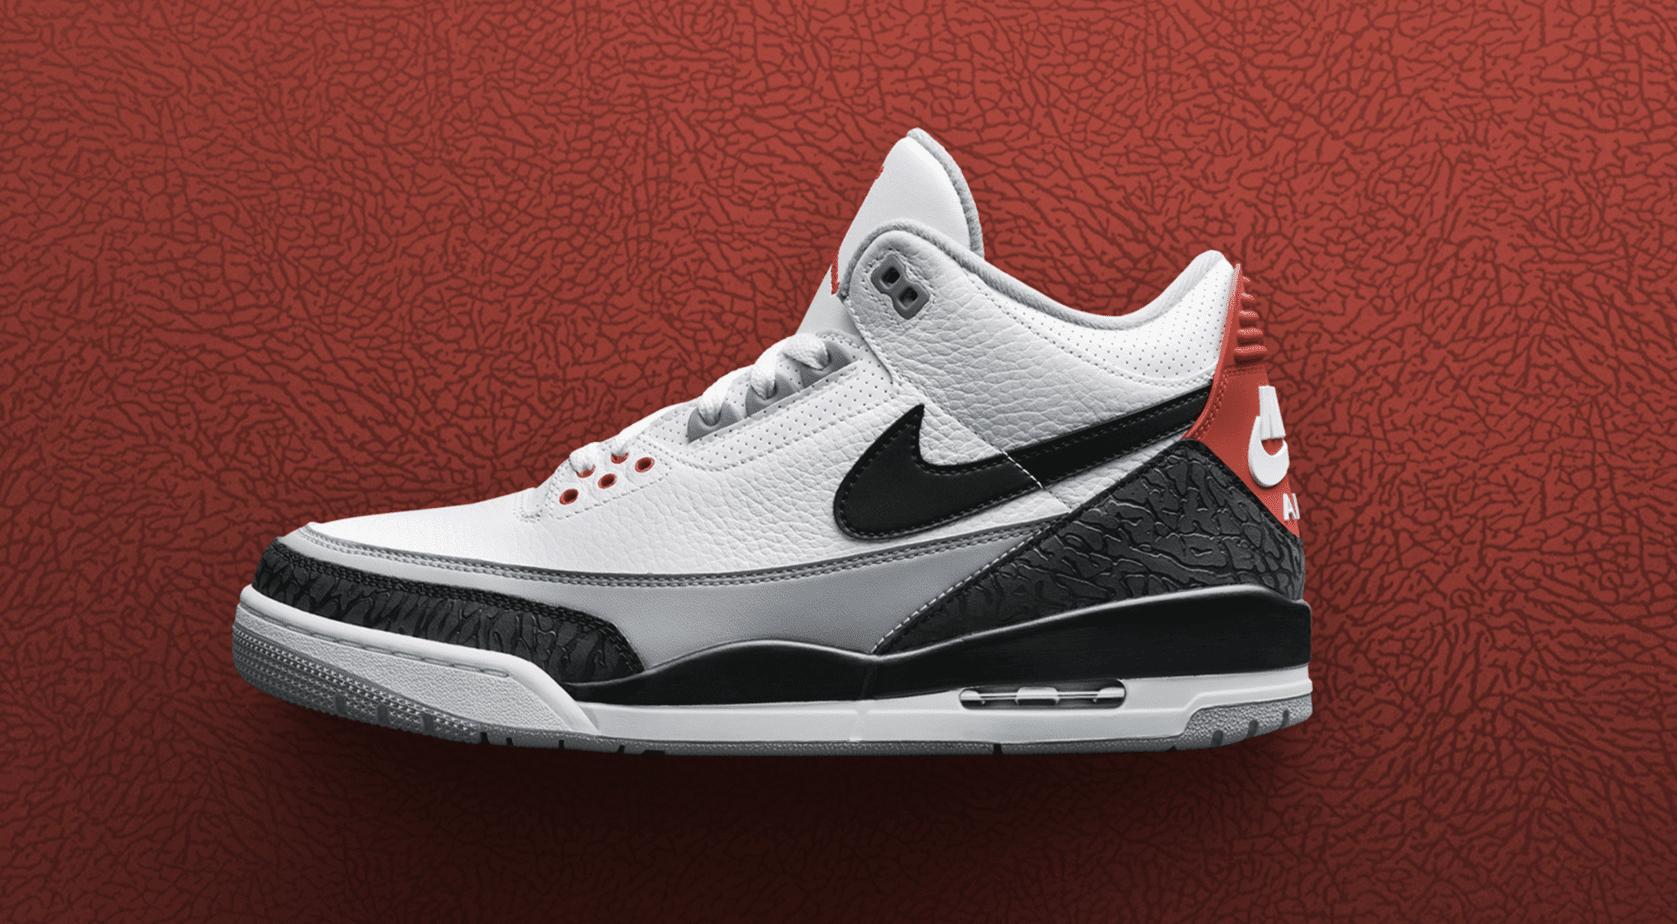 Mens Air Jordan 3 Tinker Fire Red Nrg Shoe